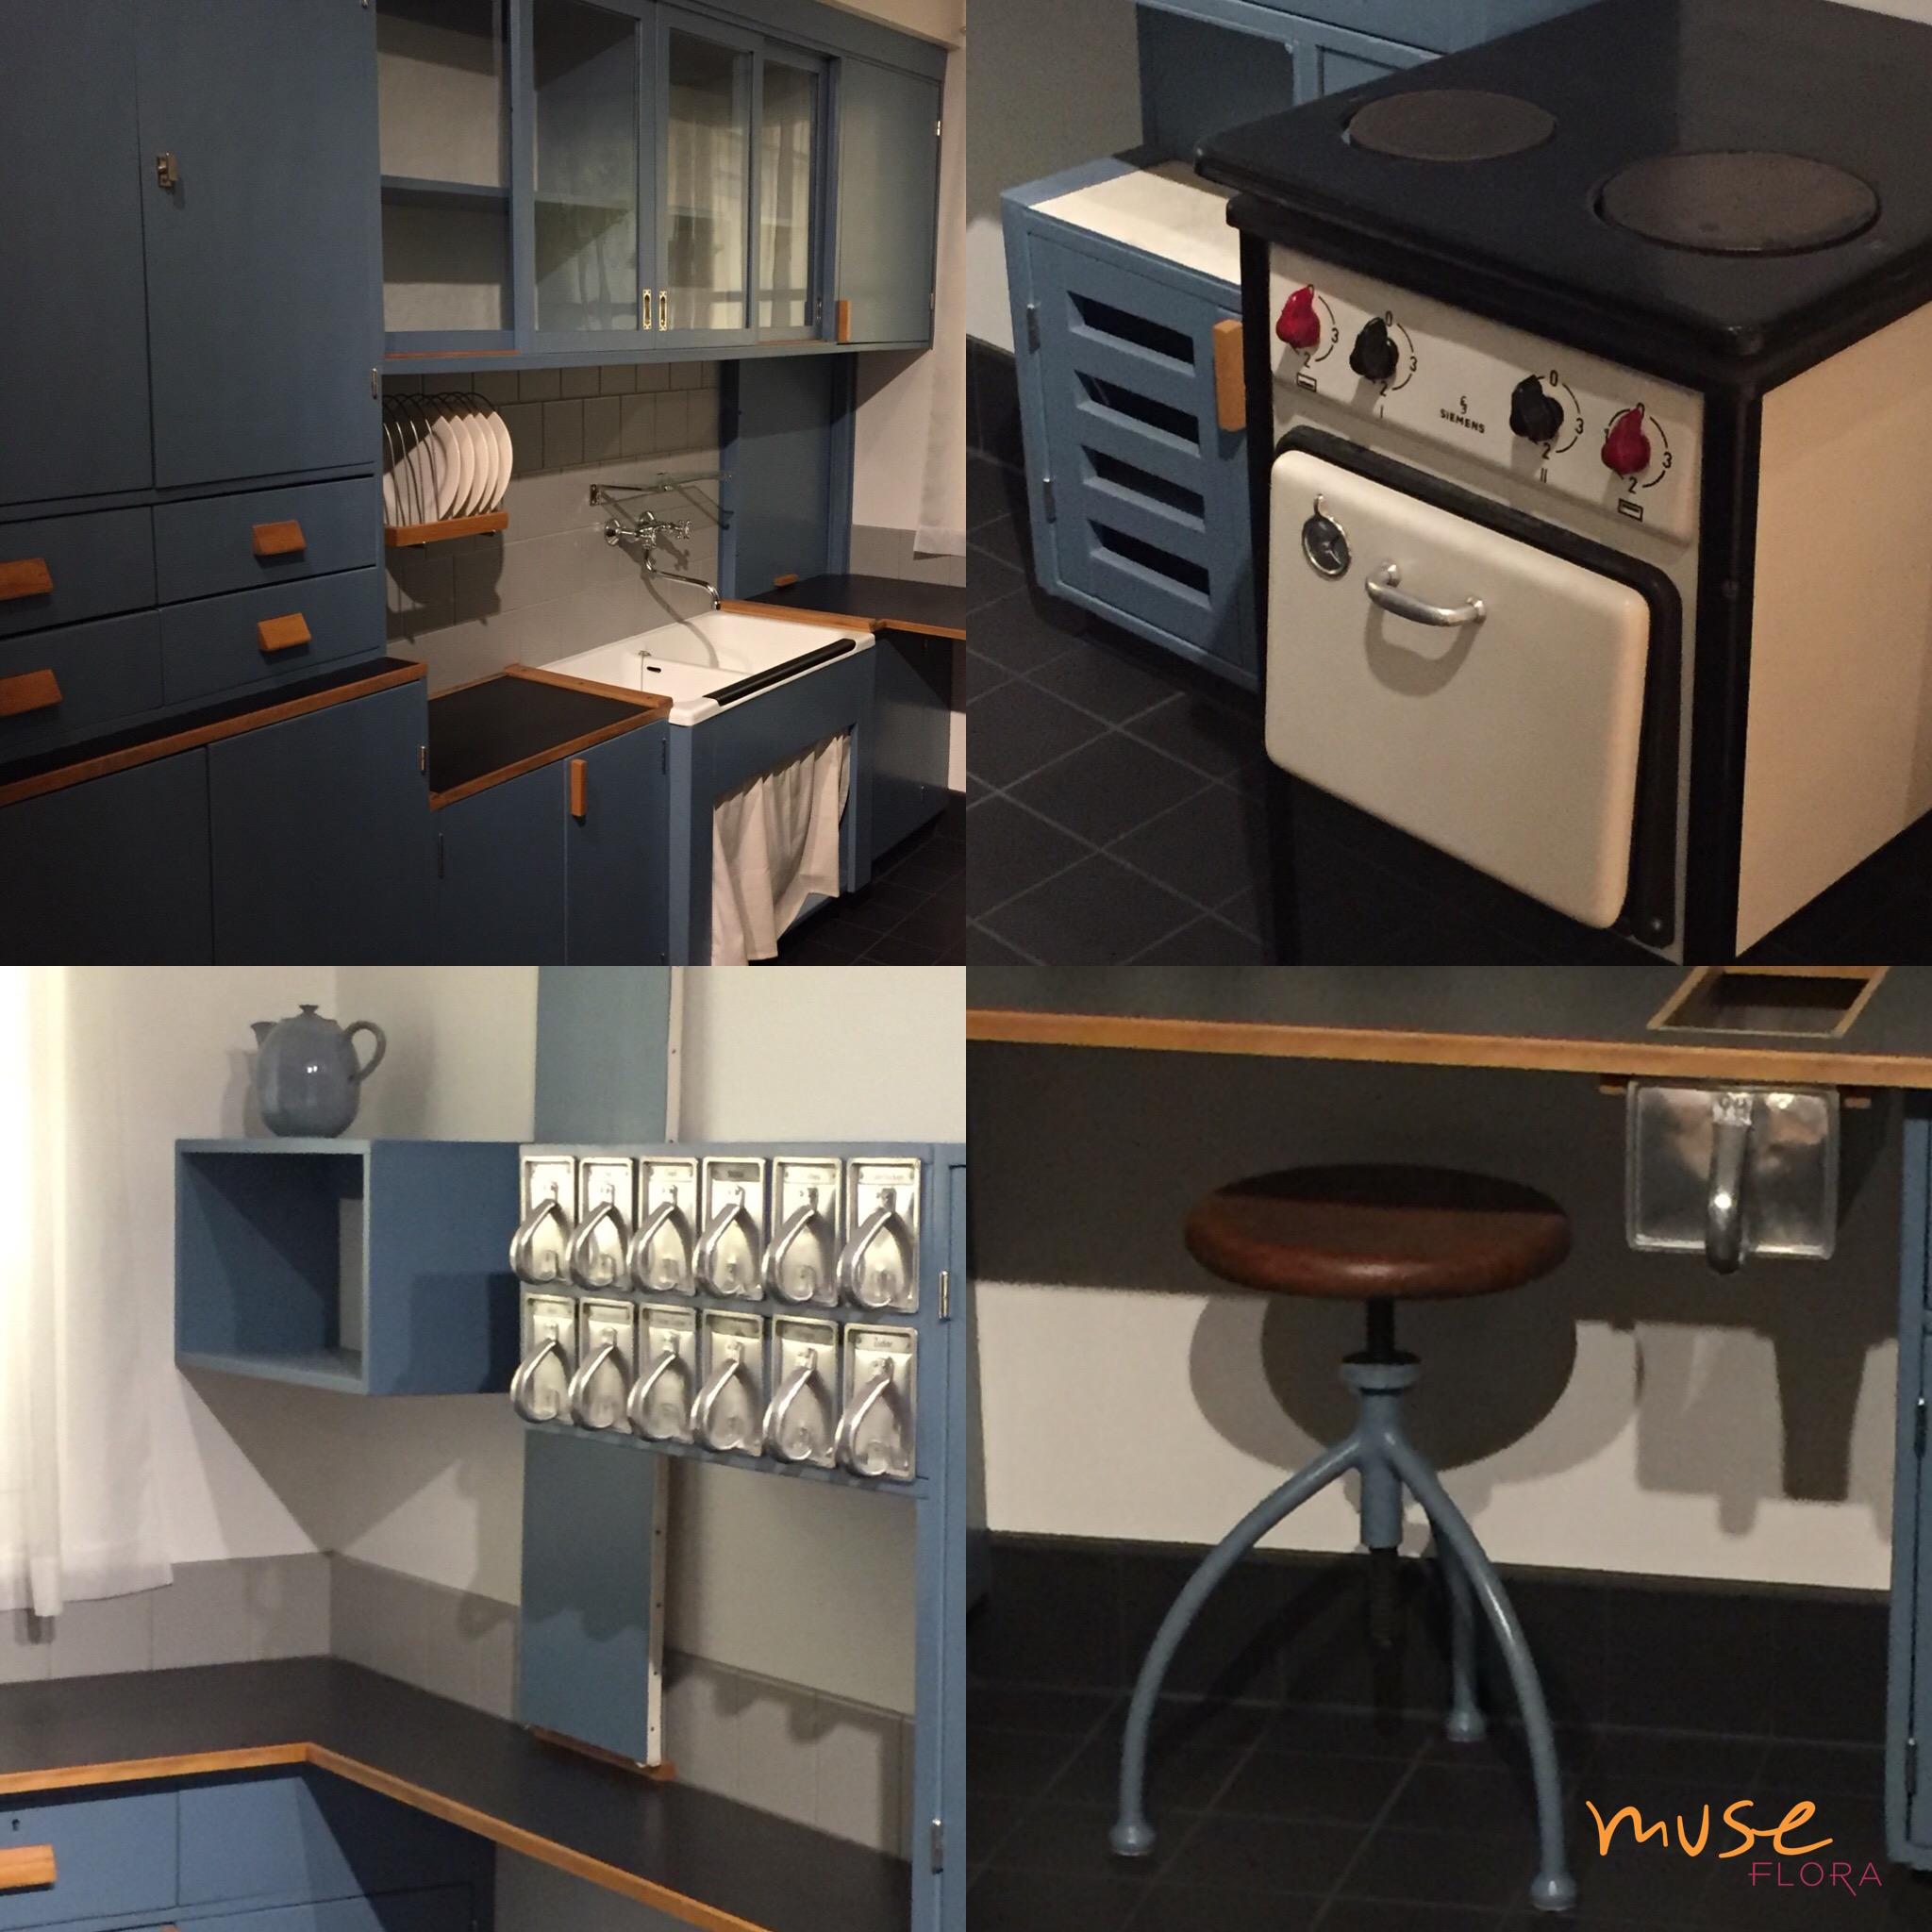 AIB 2018 Frankfurt Kitchen collage.JPG